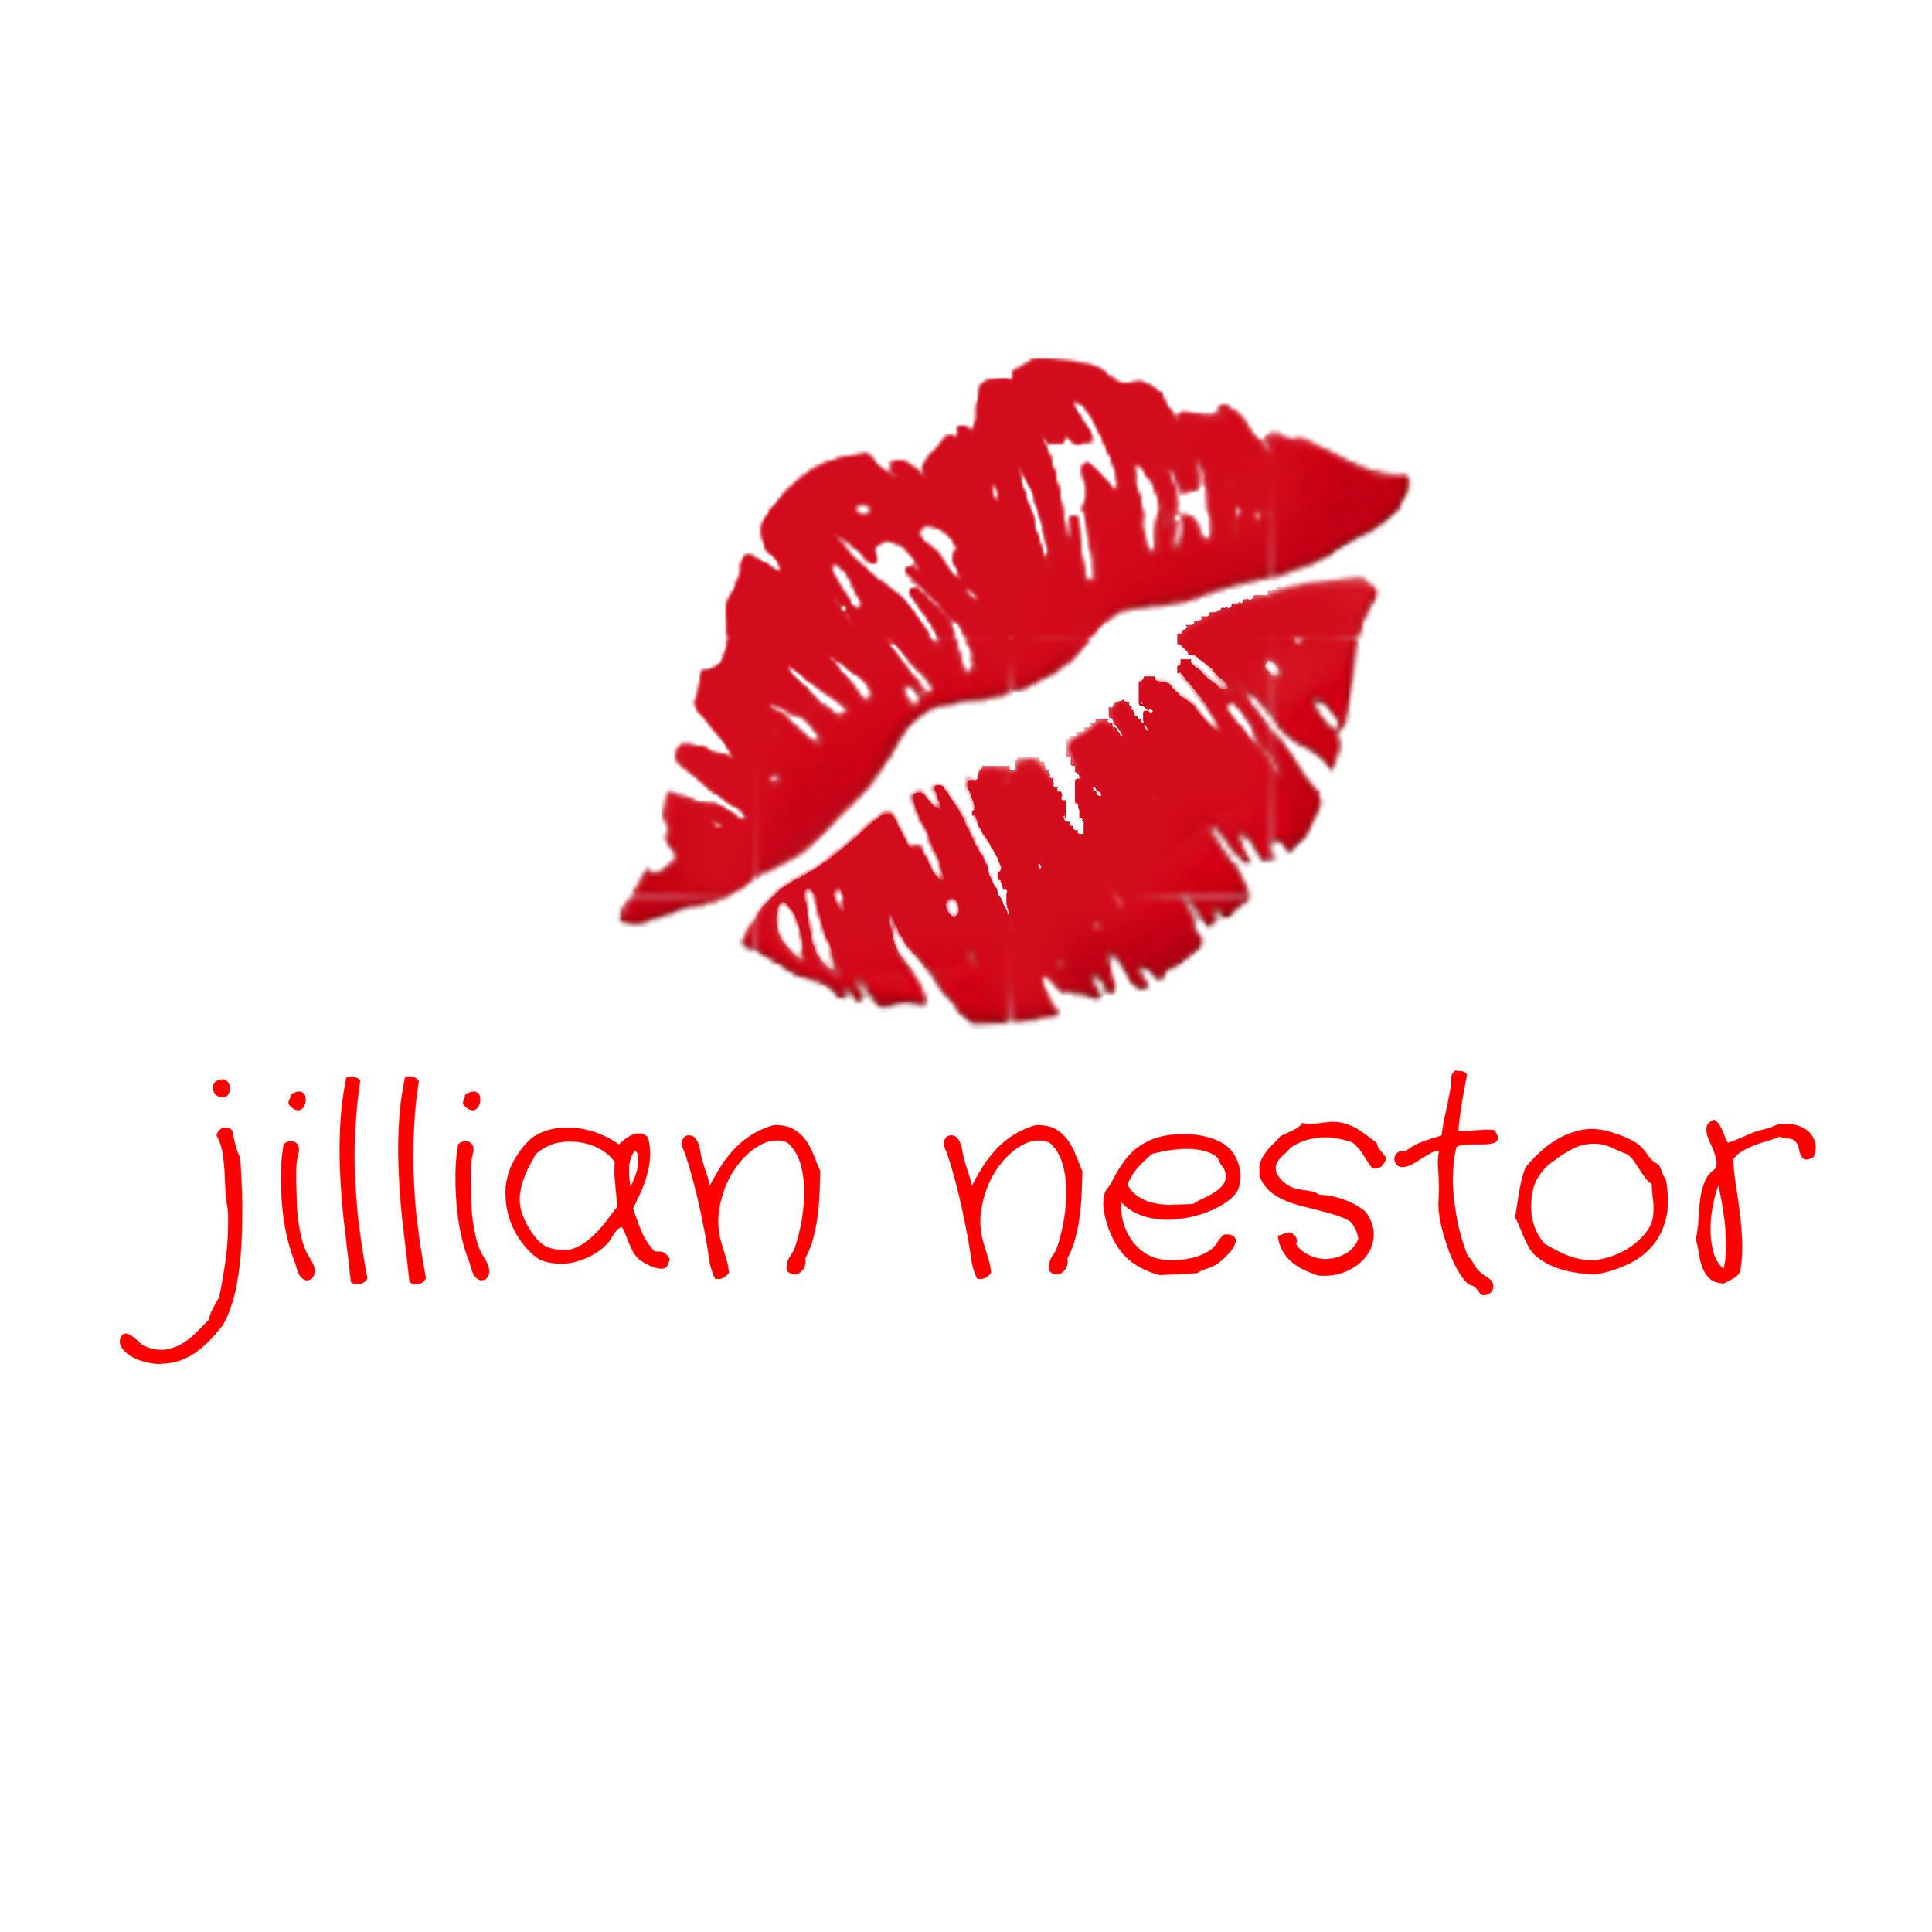 Jillian Nestor Logo 2.jpg